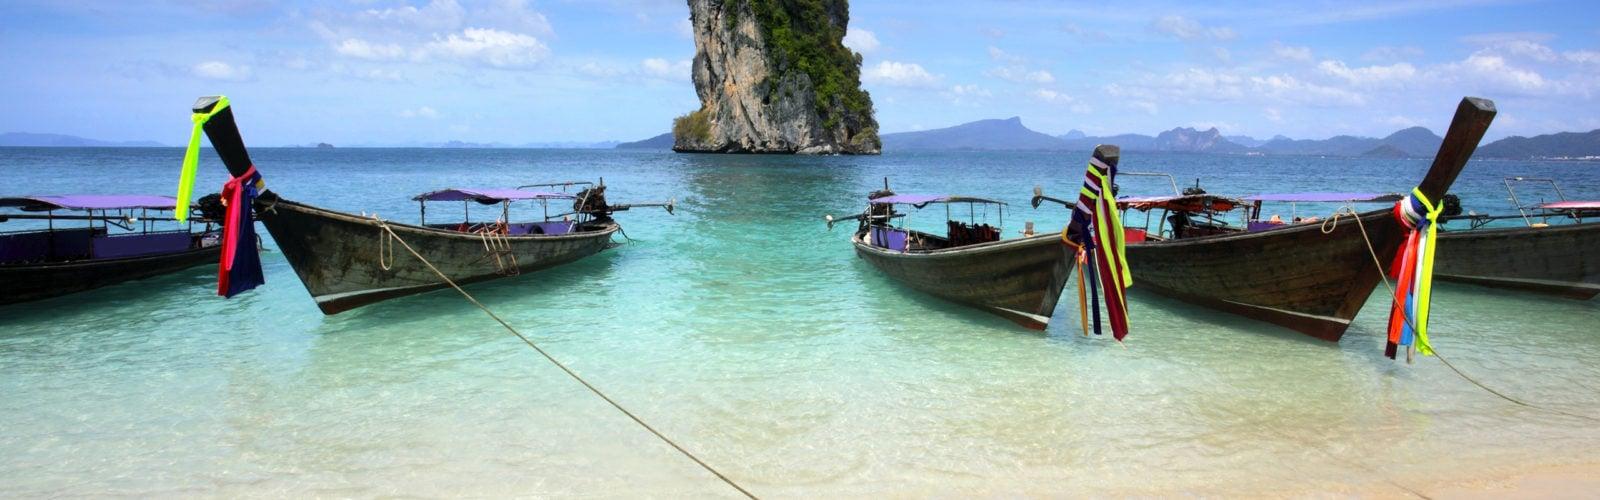 koh-poda-beach-krabi-thailand